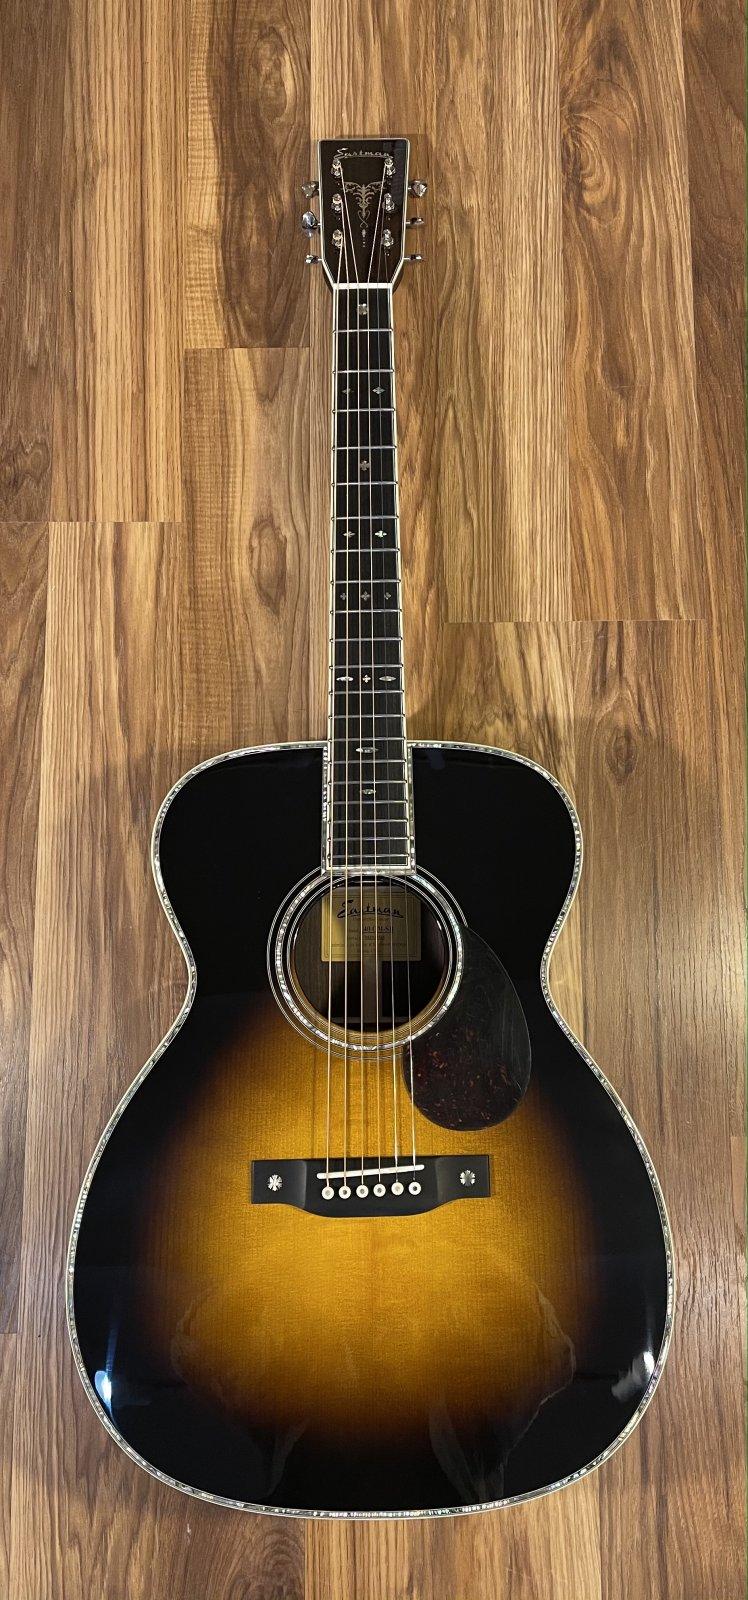 Eastman E40 OM-SB Acoustic Guitar